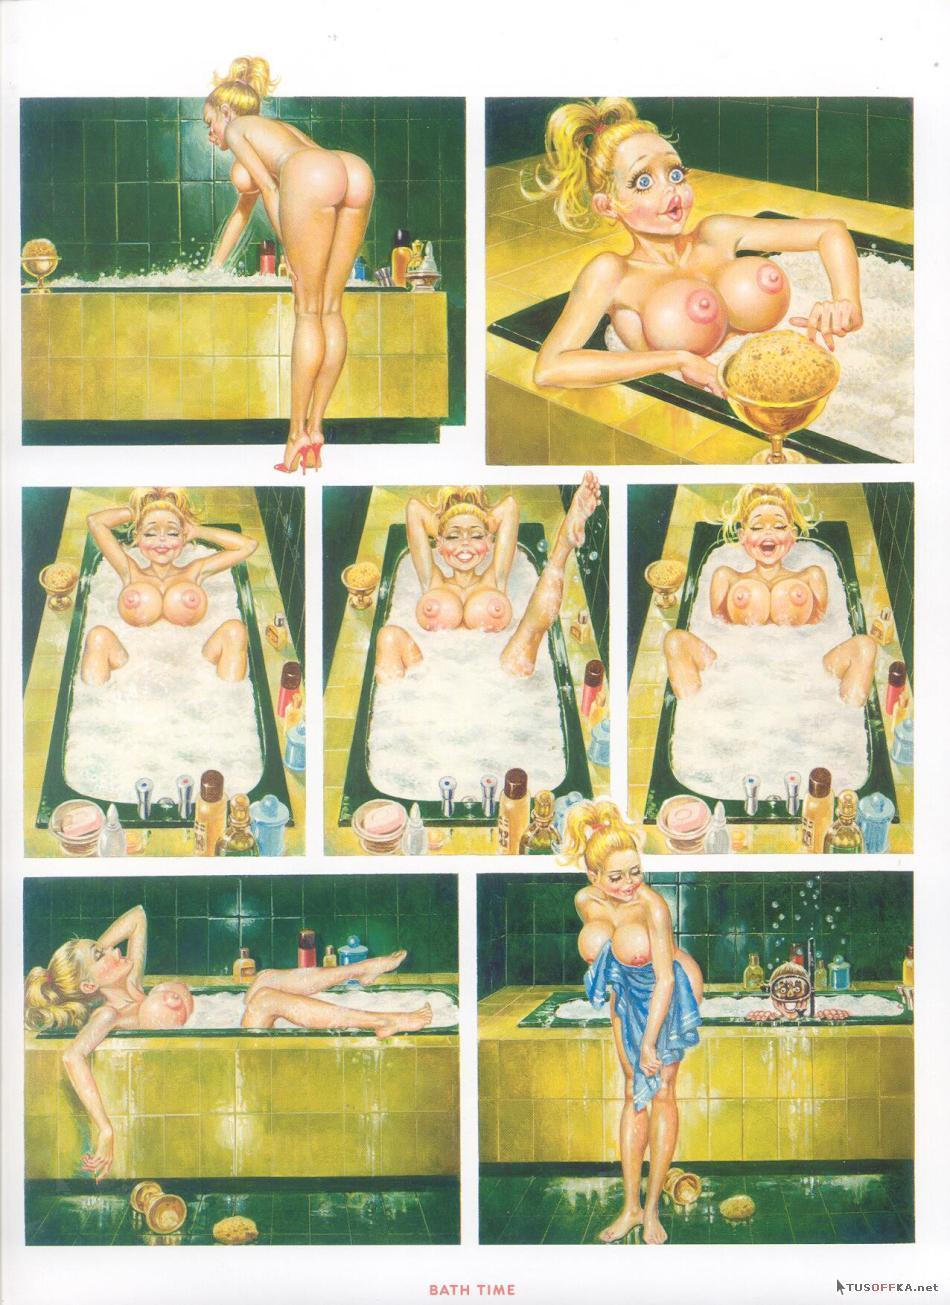 Приколы секс про блондинок 17 фотография